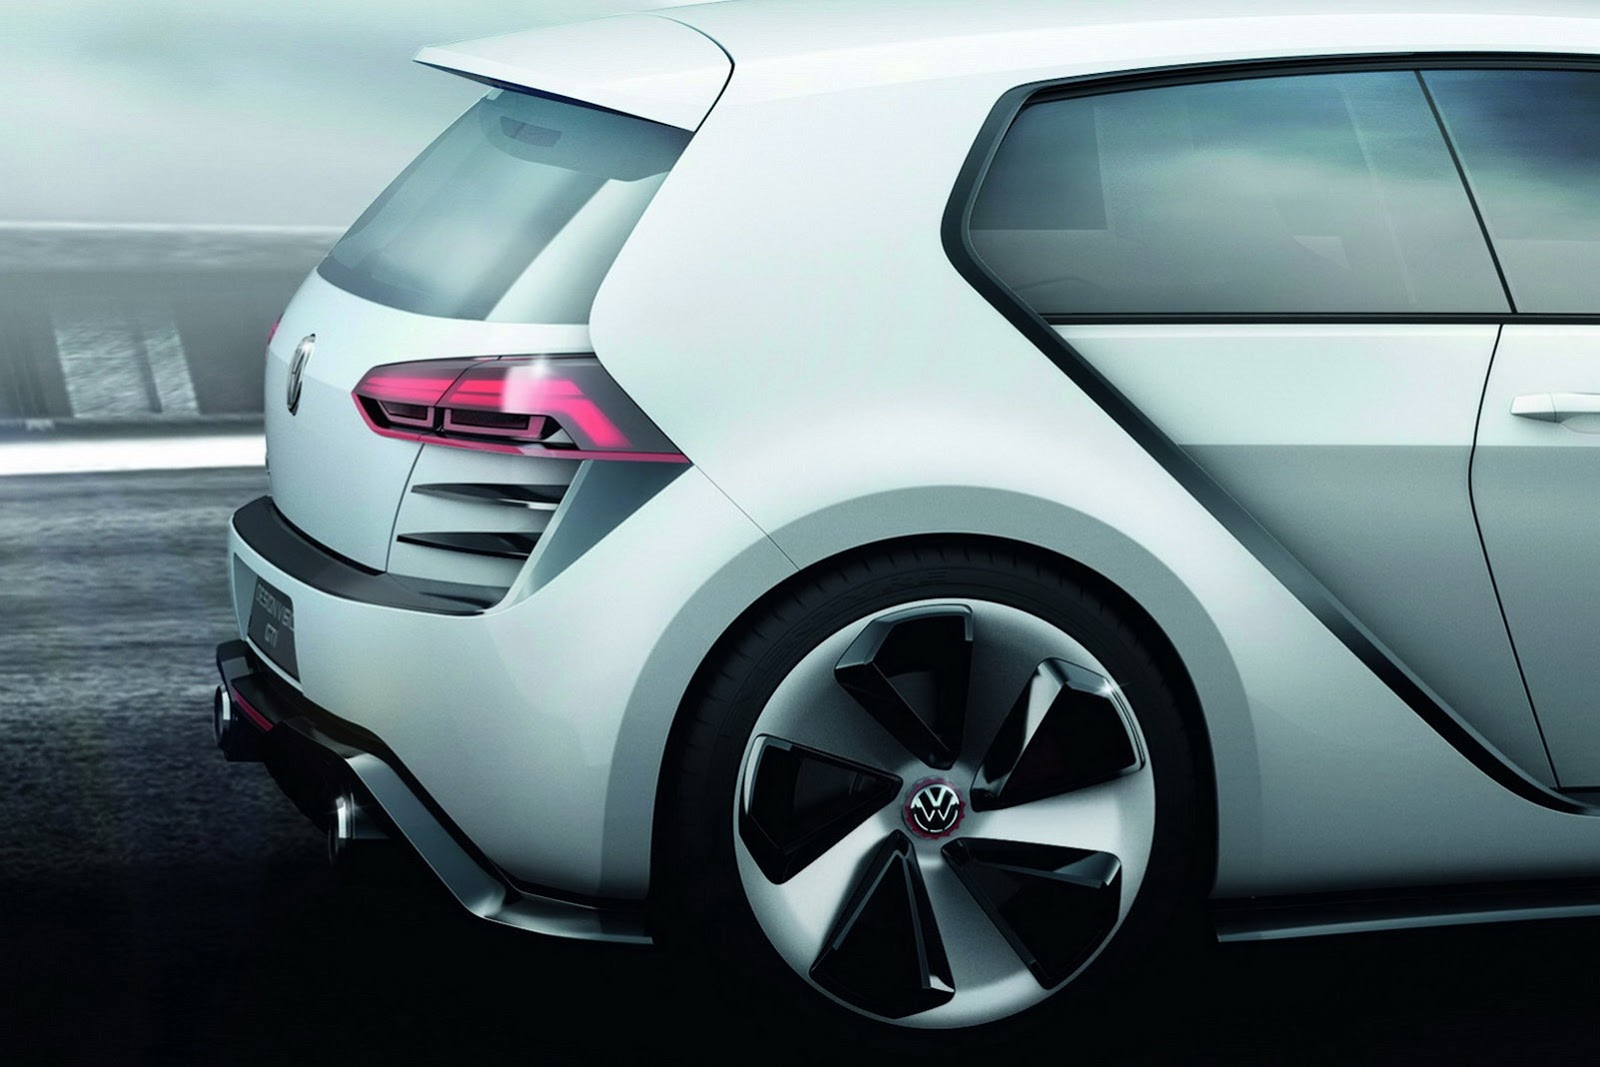 volkswagen_design_vision_gti_concept_06